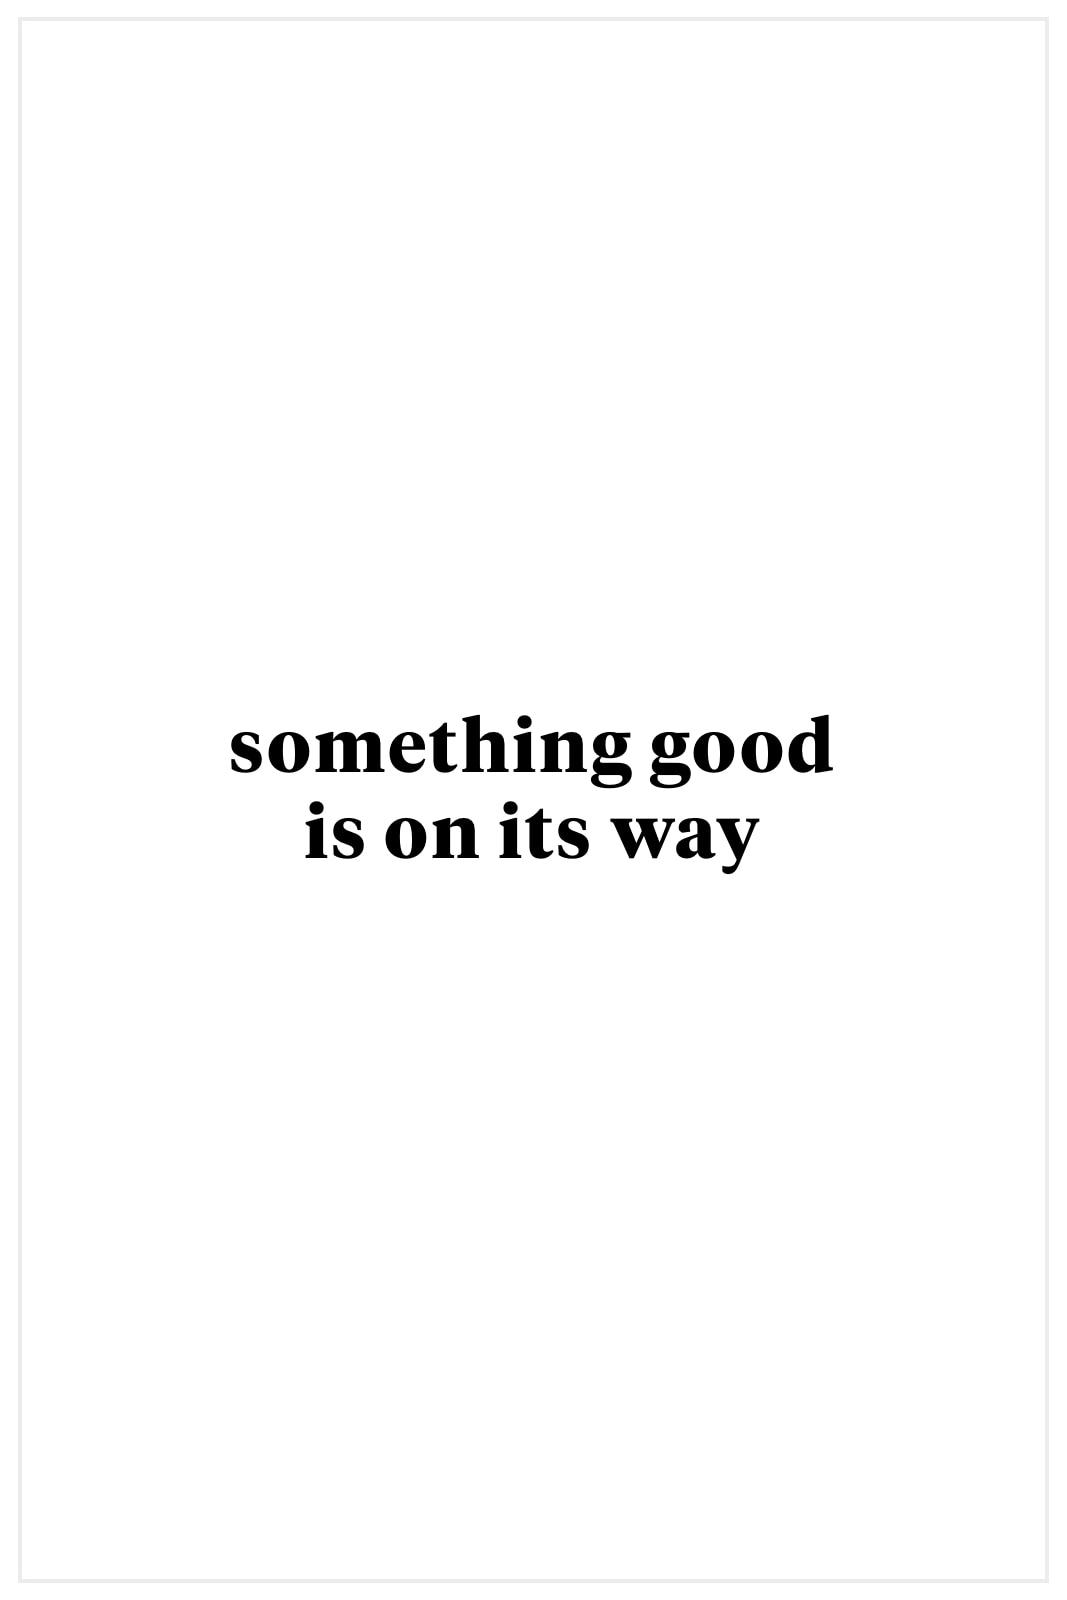 2019 Fashion Sneaker Reviews: GOLDEN GOOSE, P448, VEJA